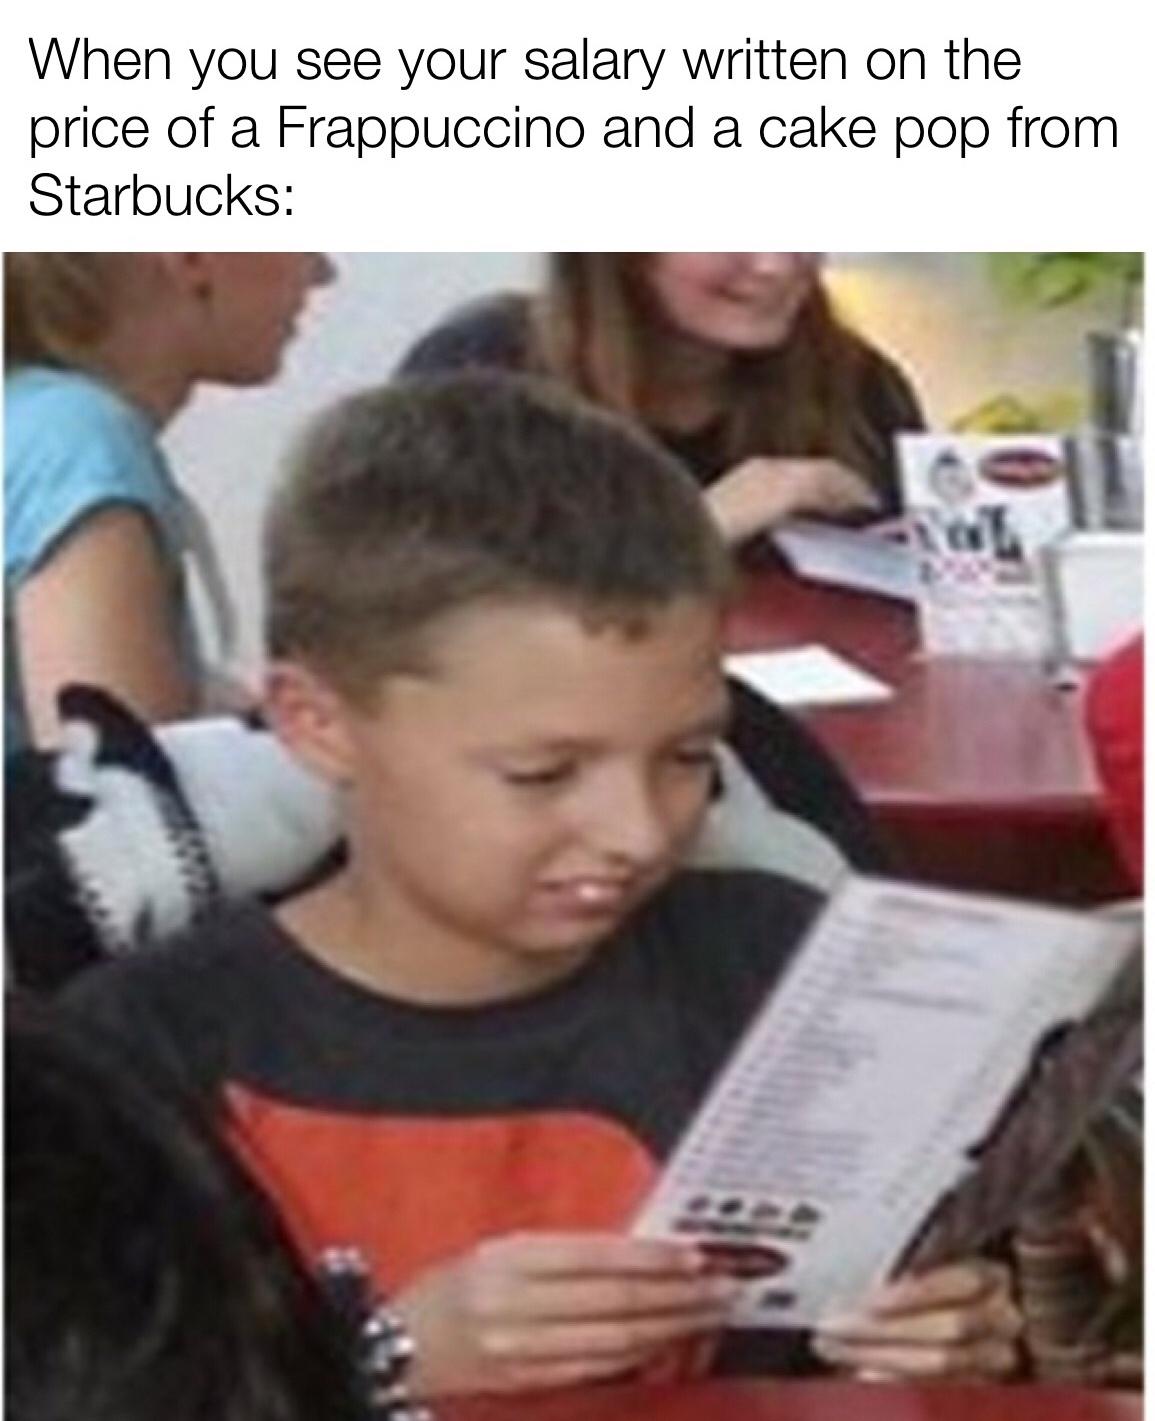 That'll be $37. - meme